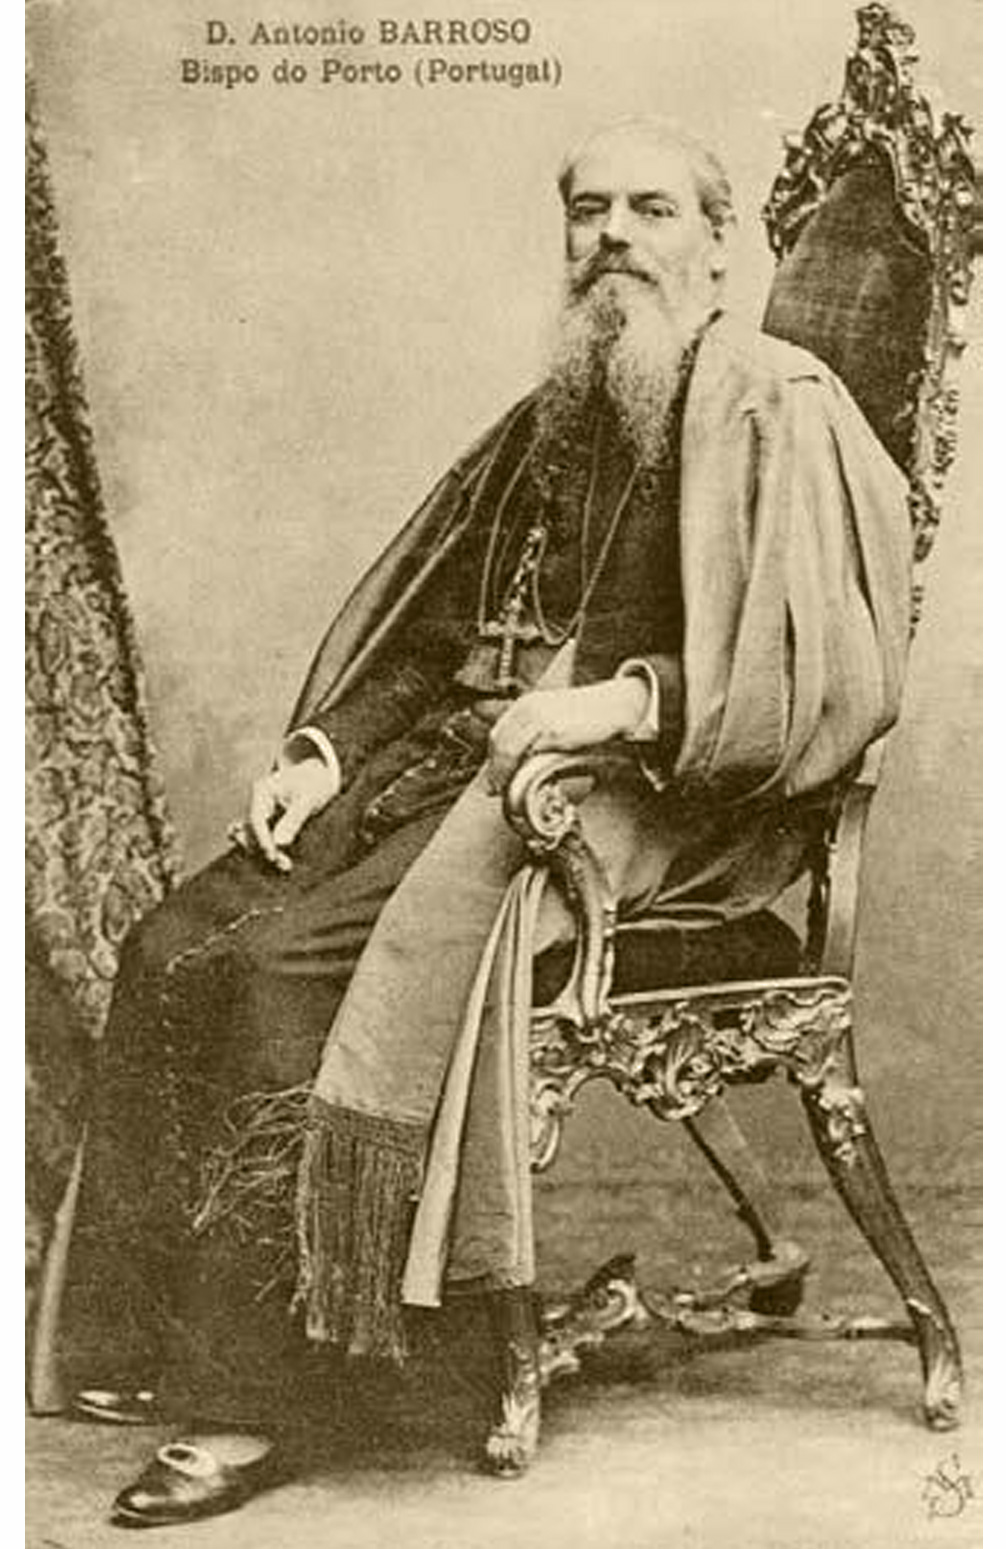 Bispo do Porto (20-5-1899  .  31-8-1918)